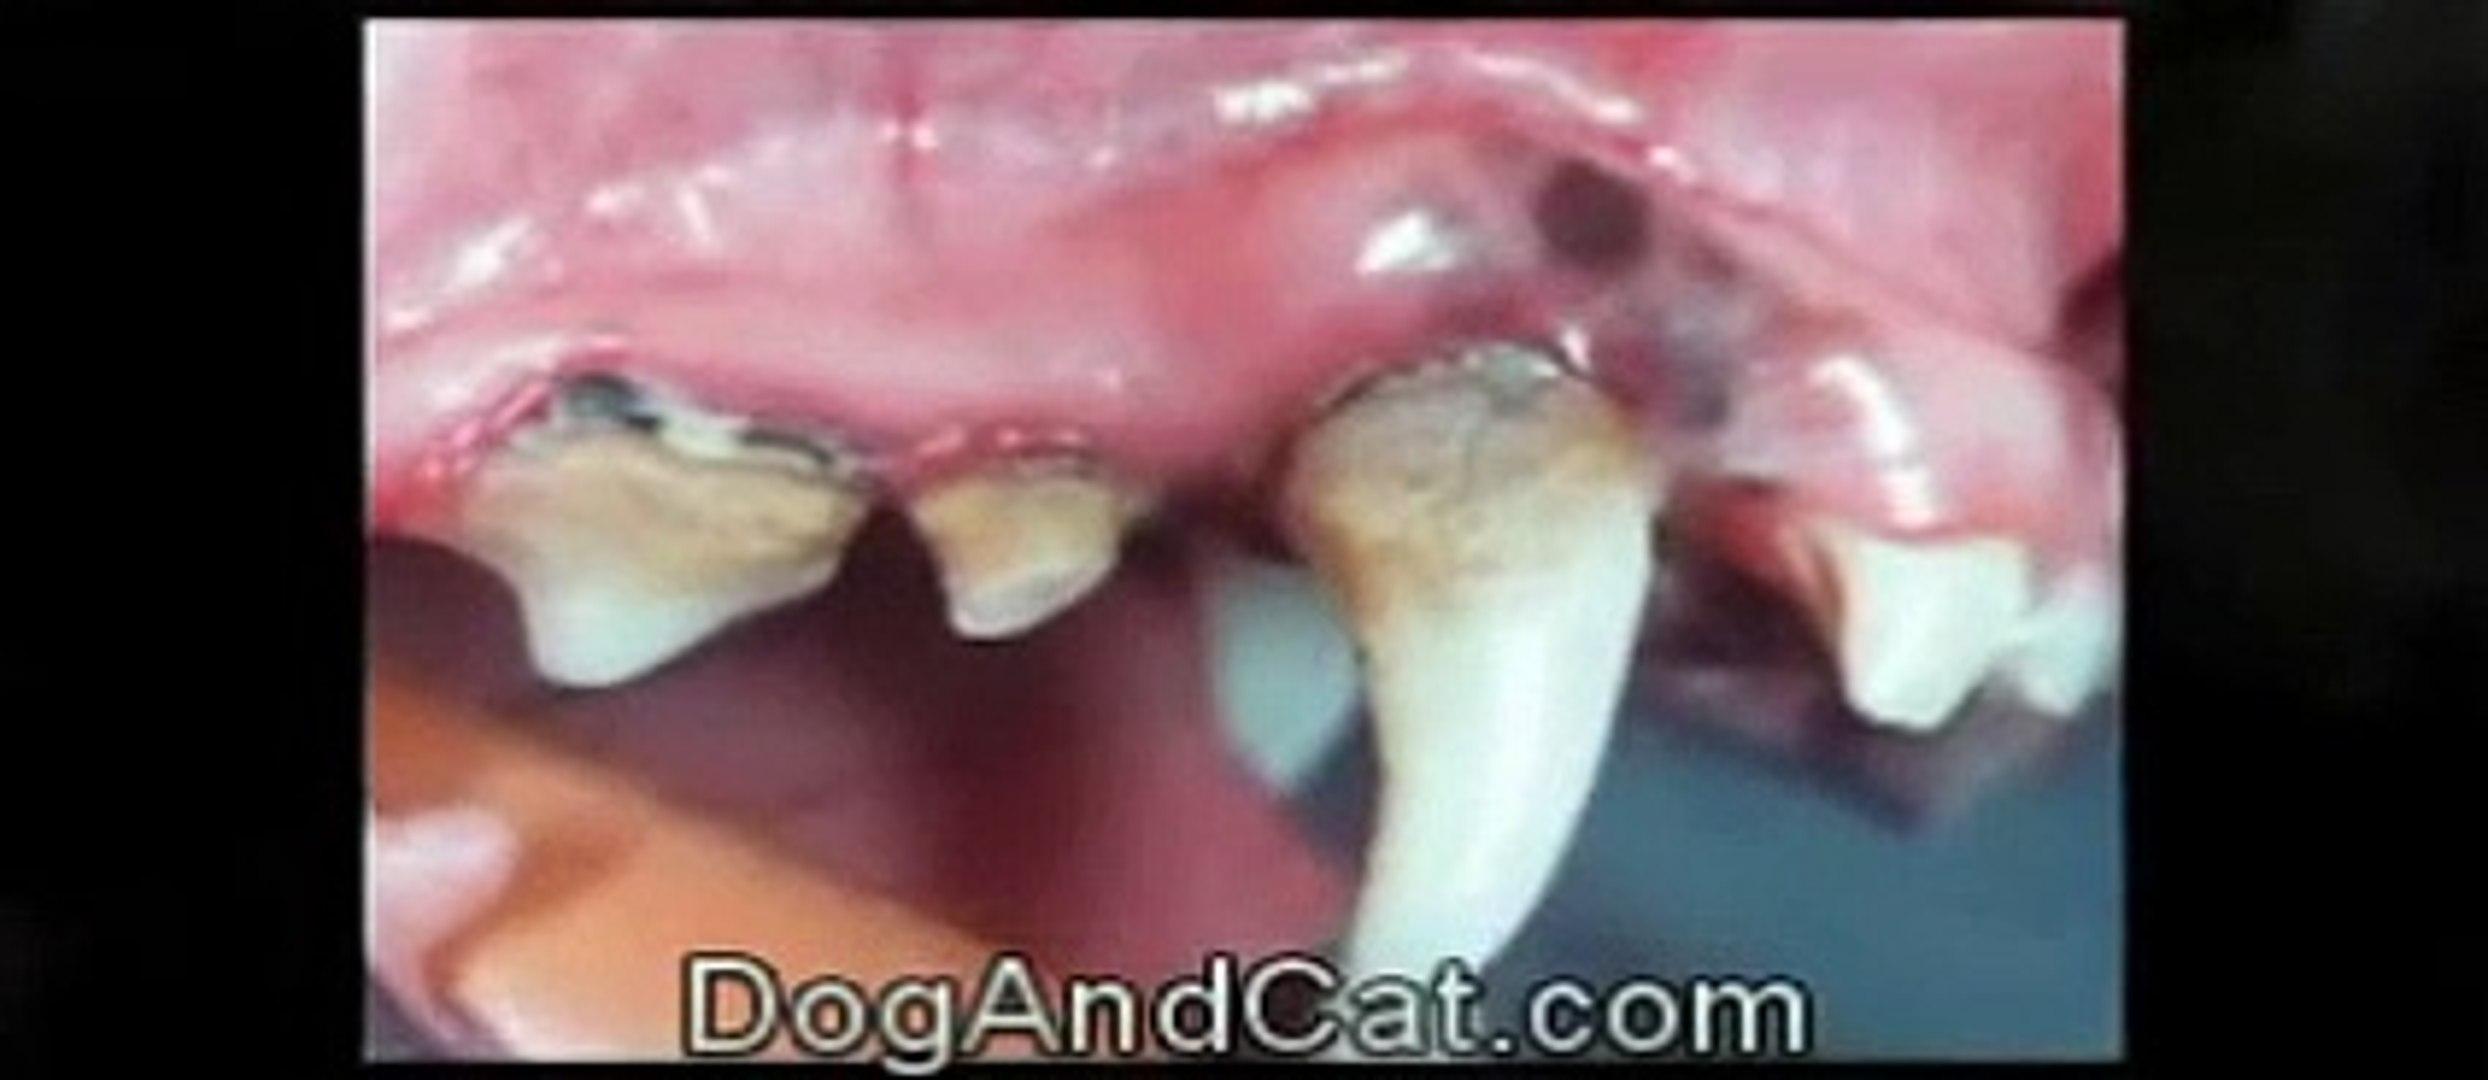 Pet Insurance | Pet Health Insurance